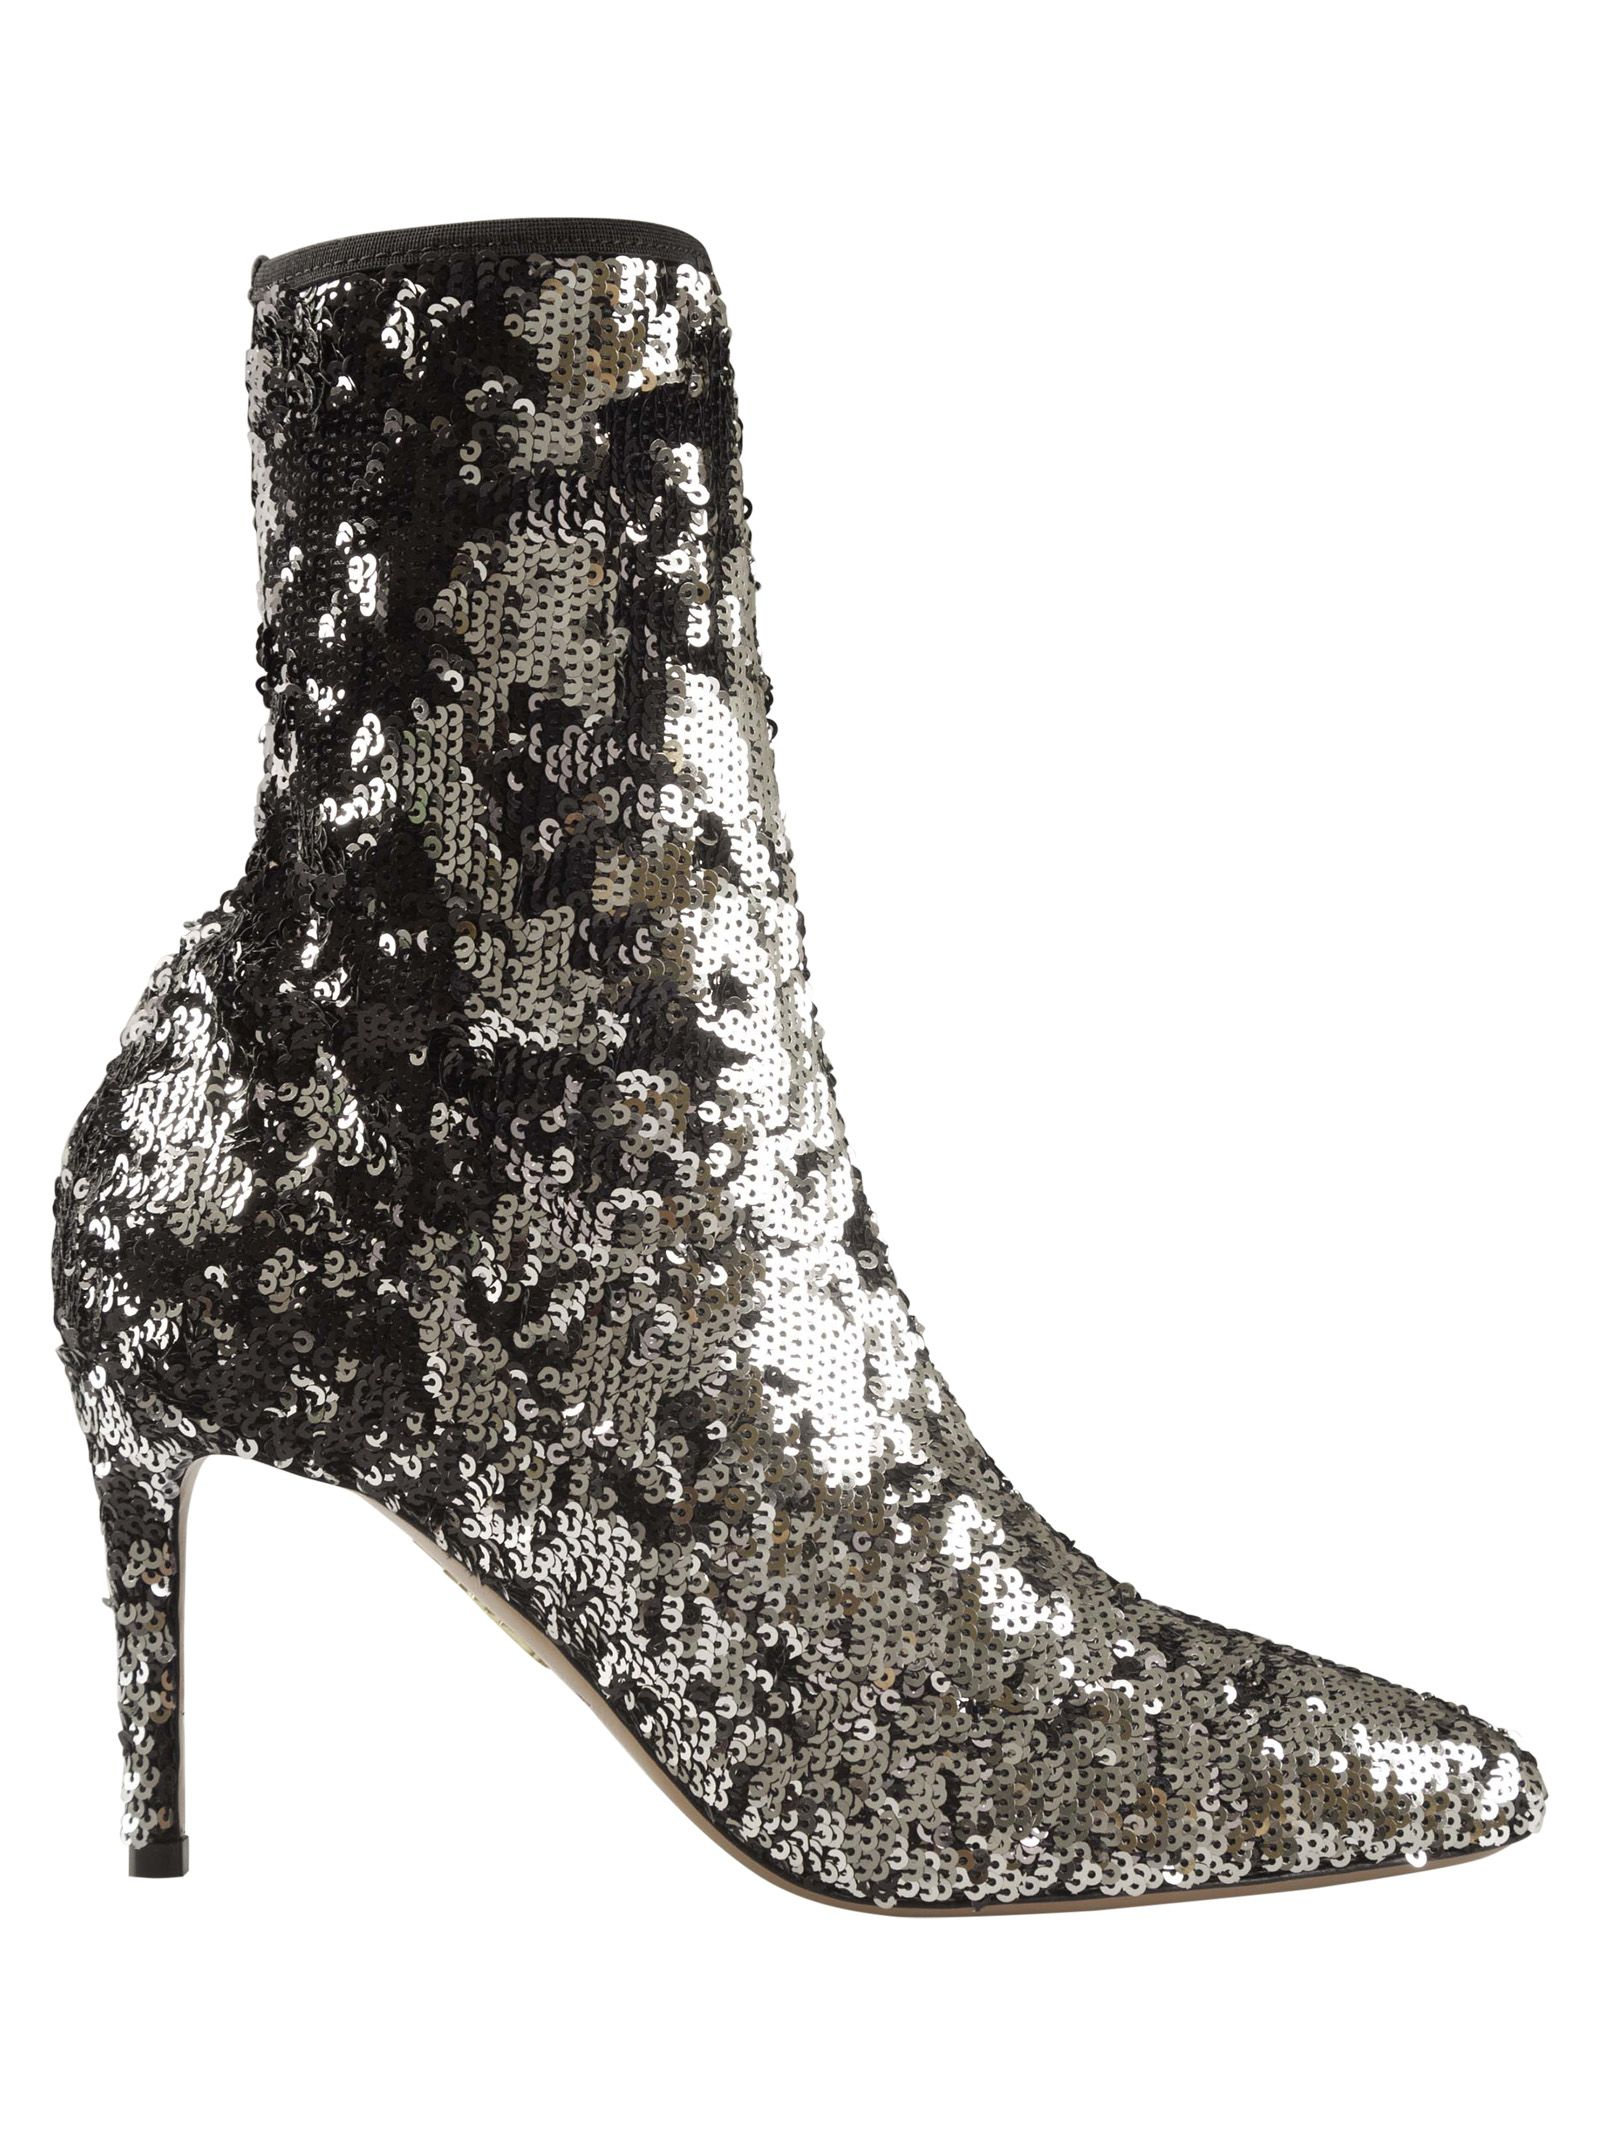 Aquazzura Sequin Embellished Ankle Boots